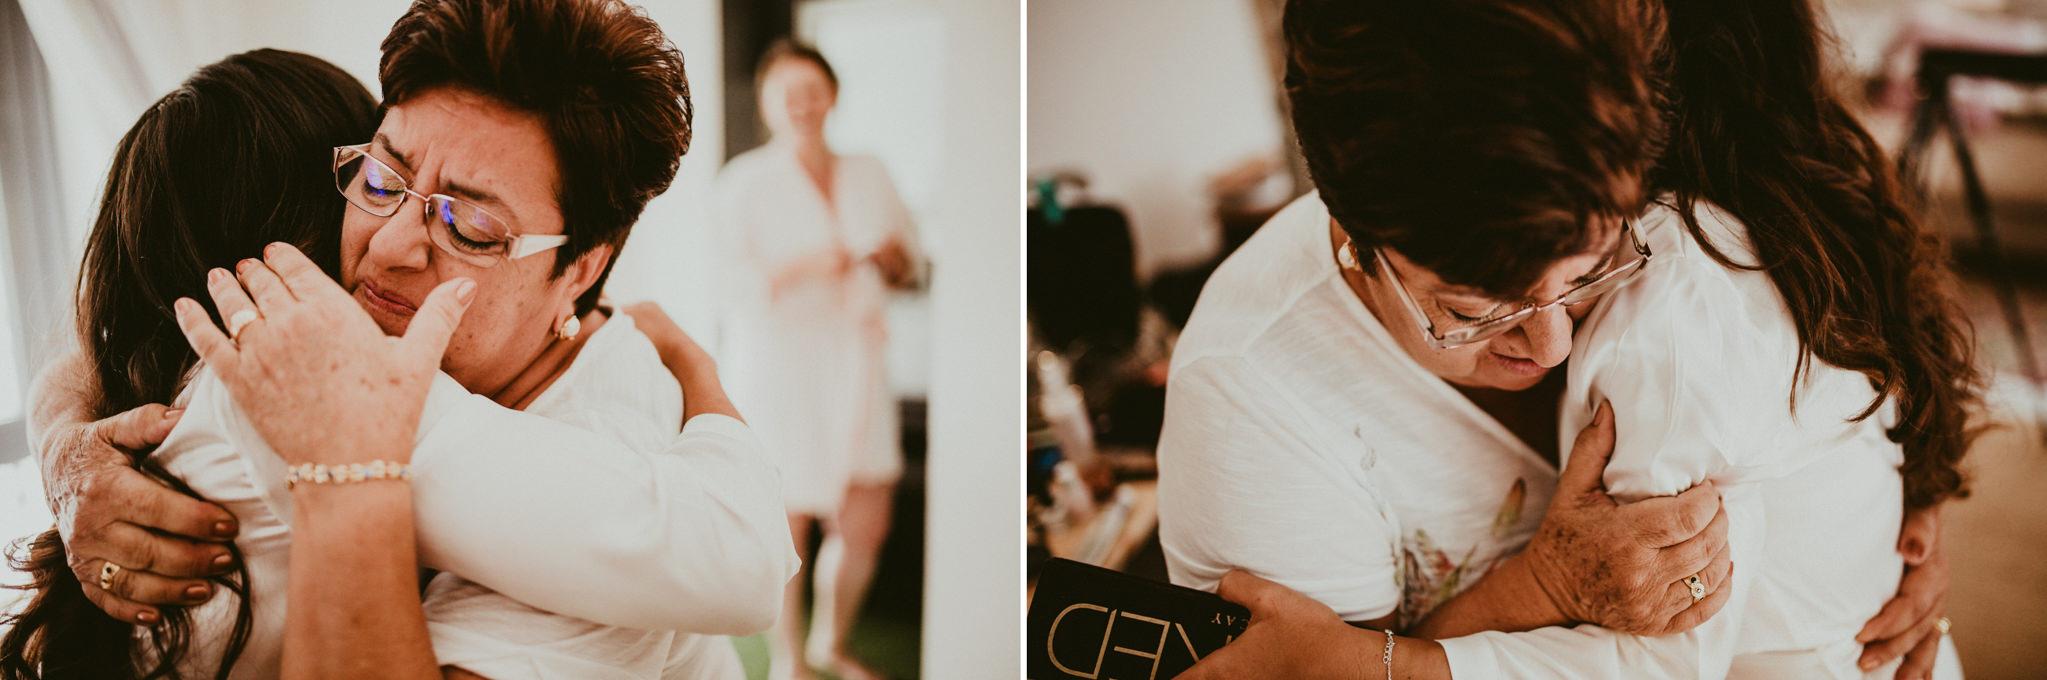 Jessica+Oscar-wedding-134